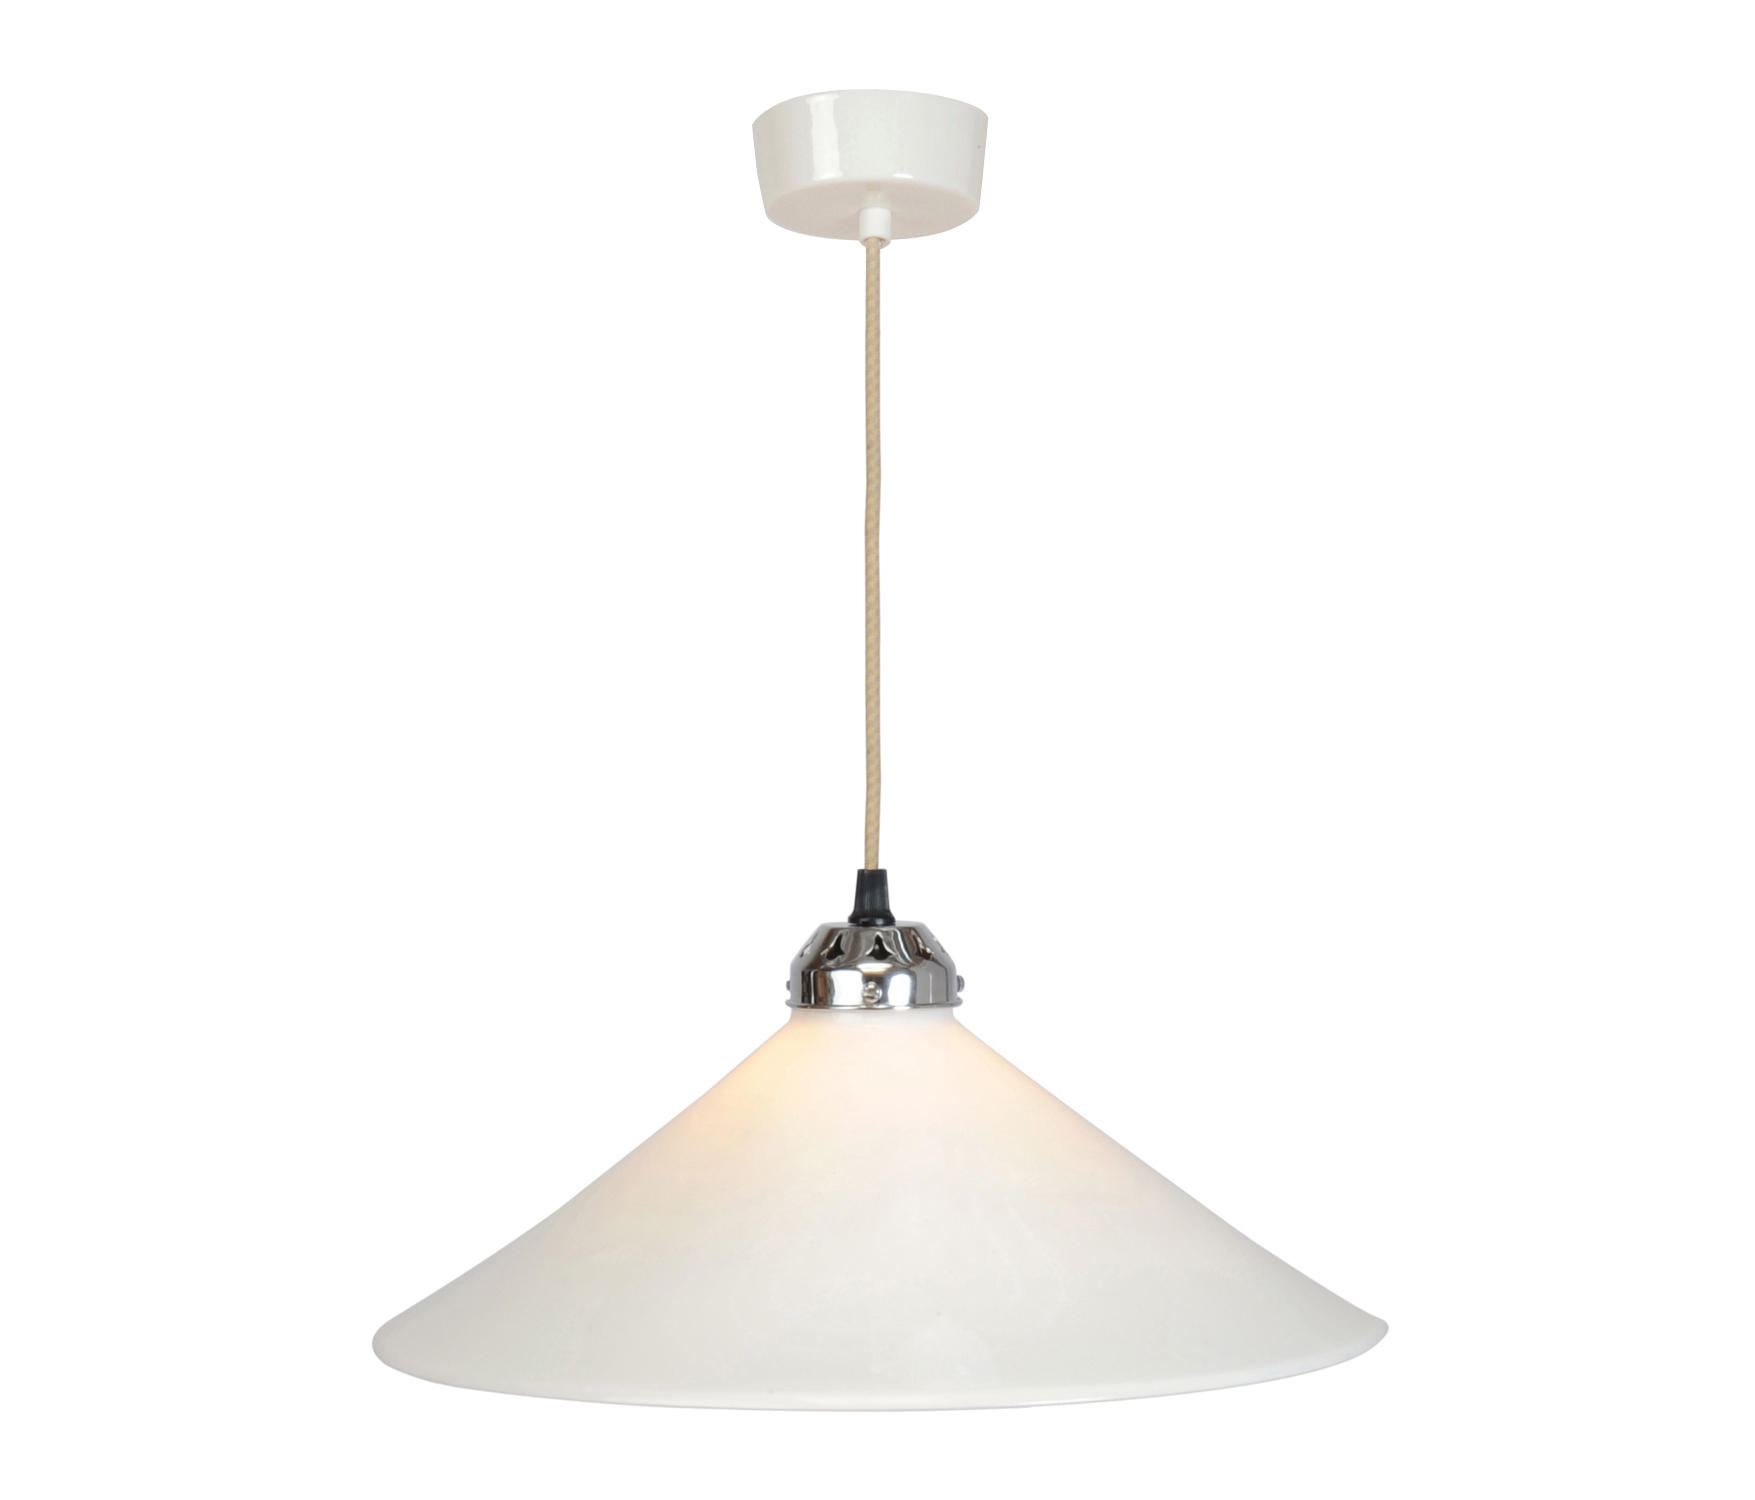 Cobb large plain pendant light white iluminaci n - Iluminacion original ...